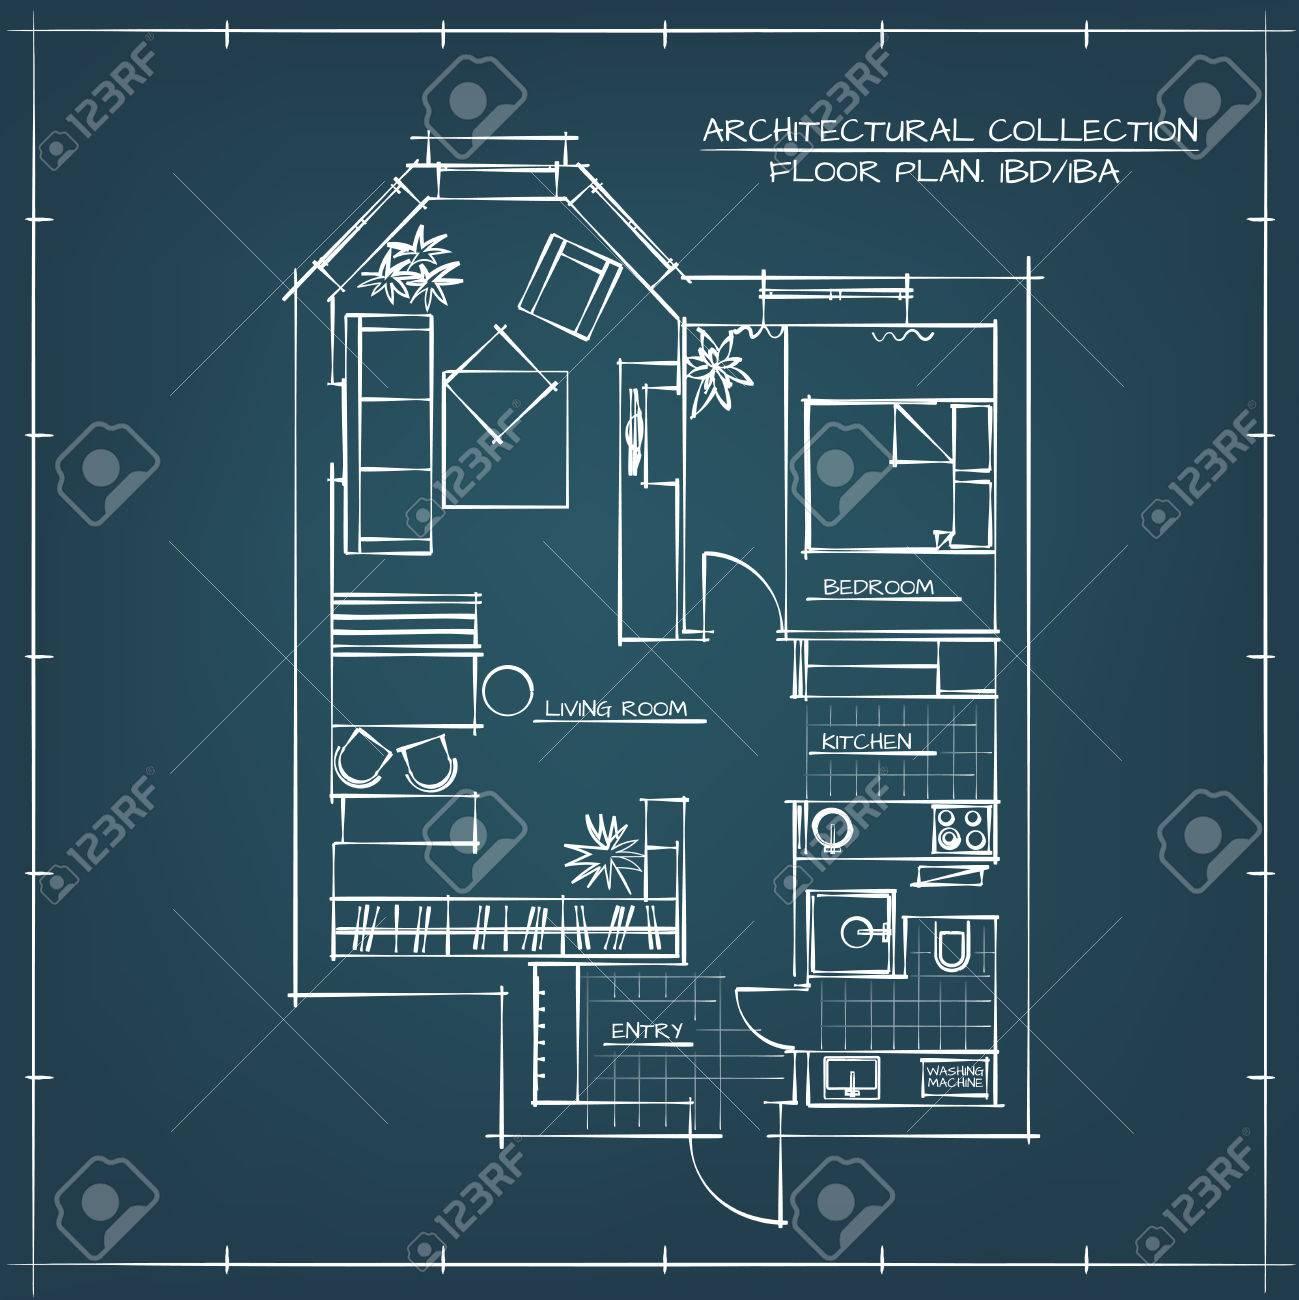 Architectural blueprint floor planudio apartment with one architectural blueprint floor planudio apartment with one bedroom stock vector 55412706 malvernweather Gallery